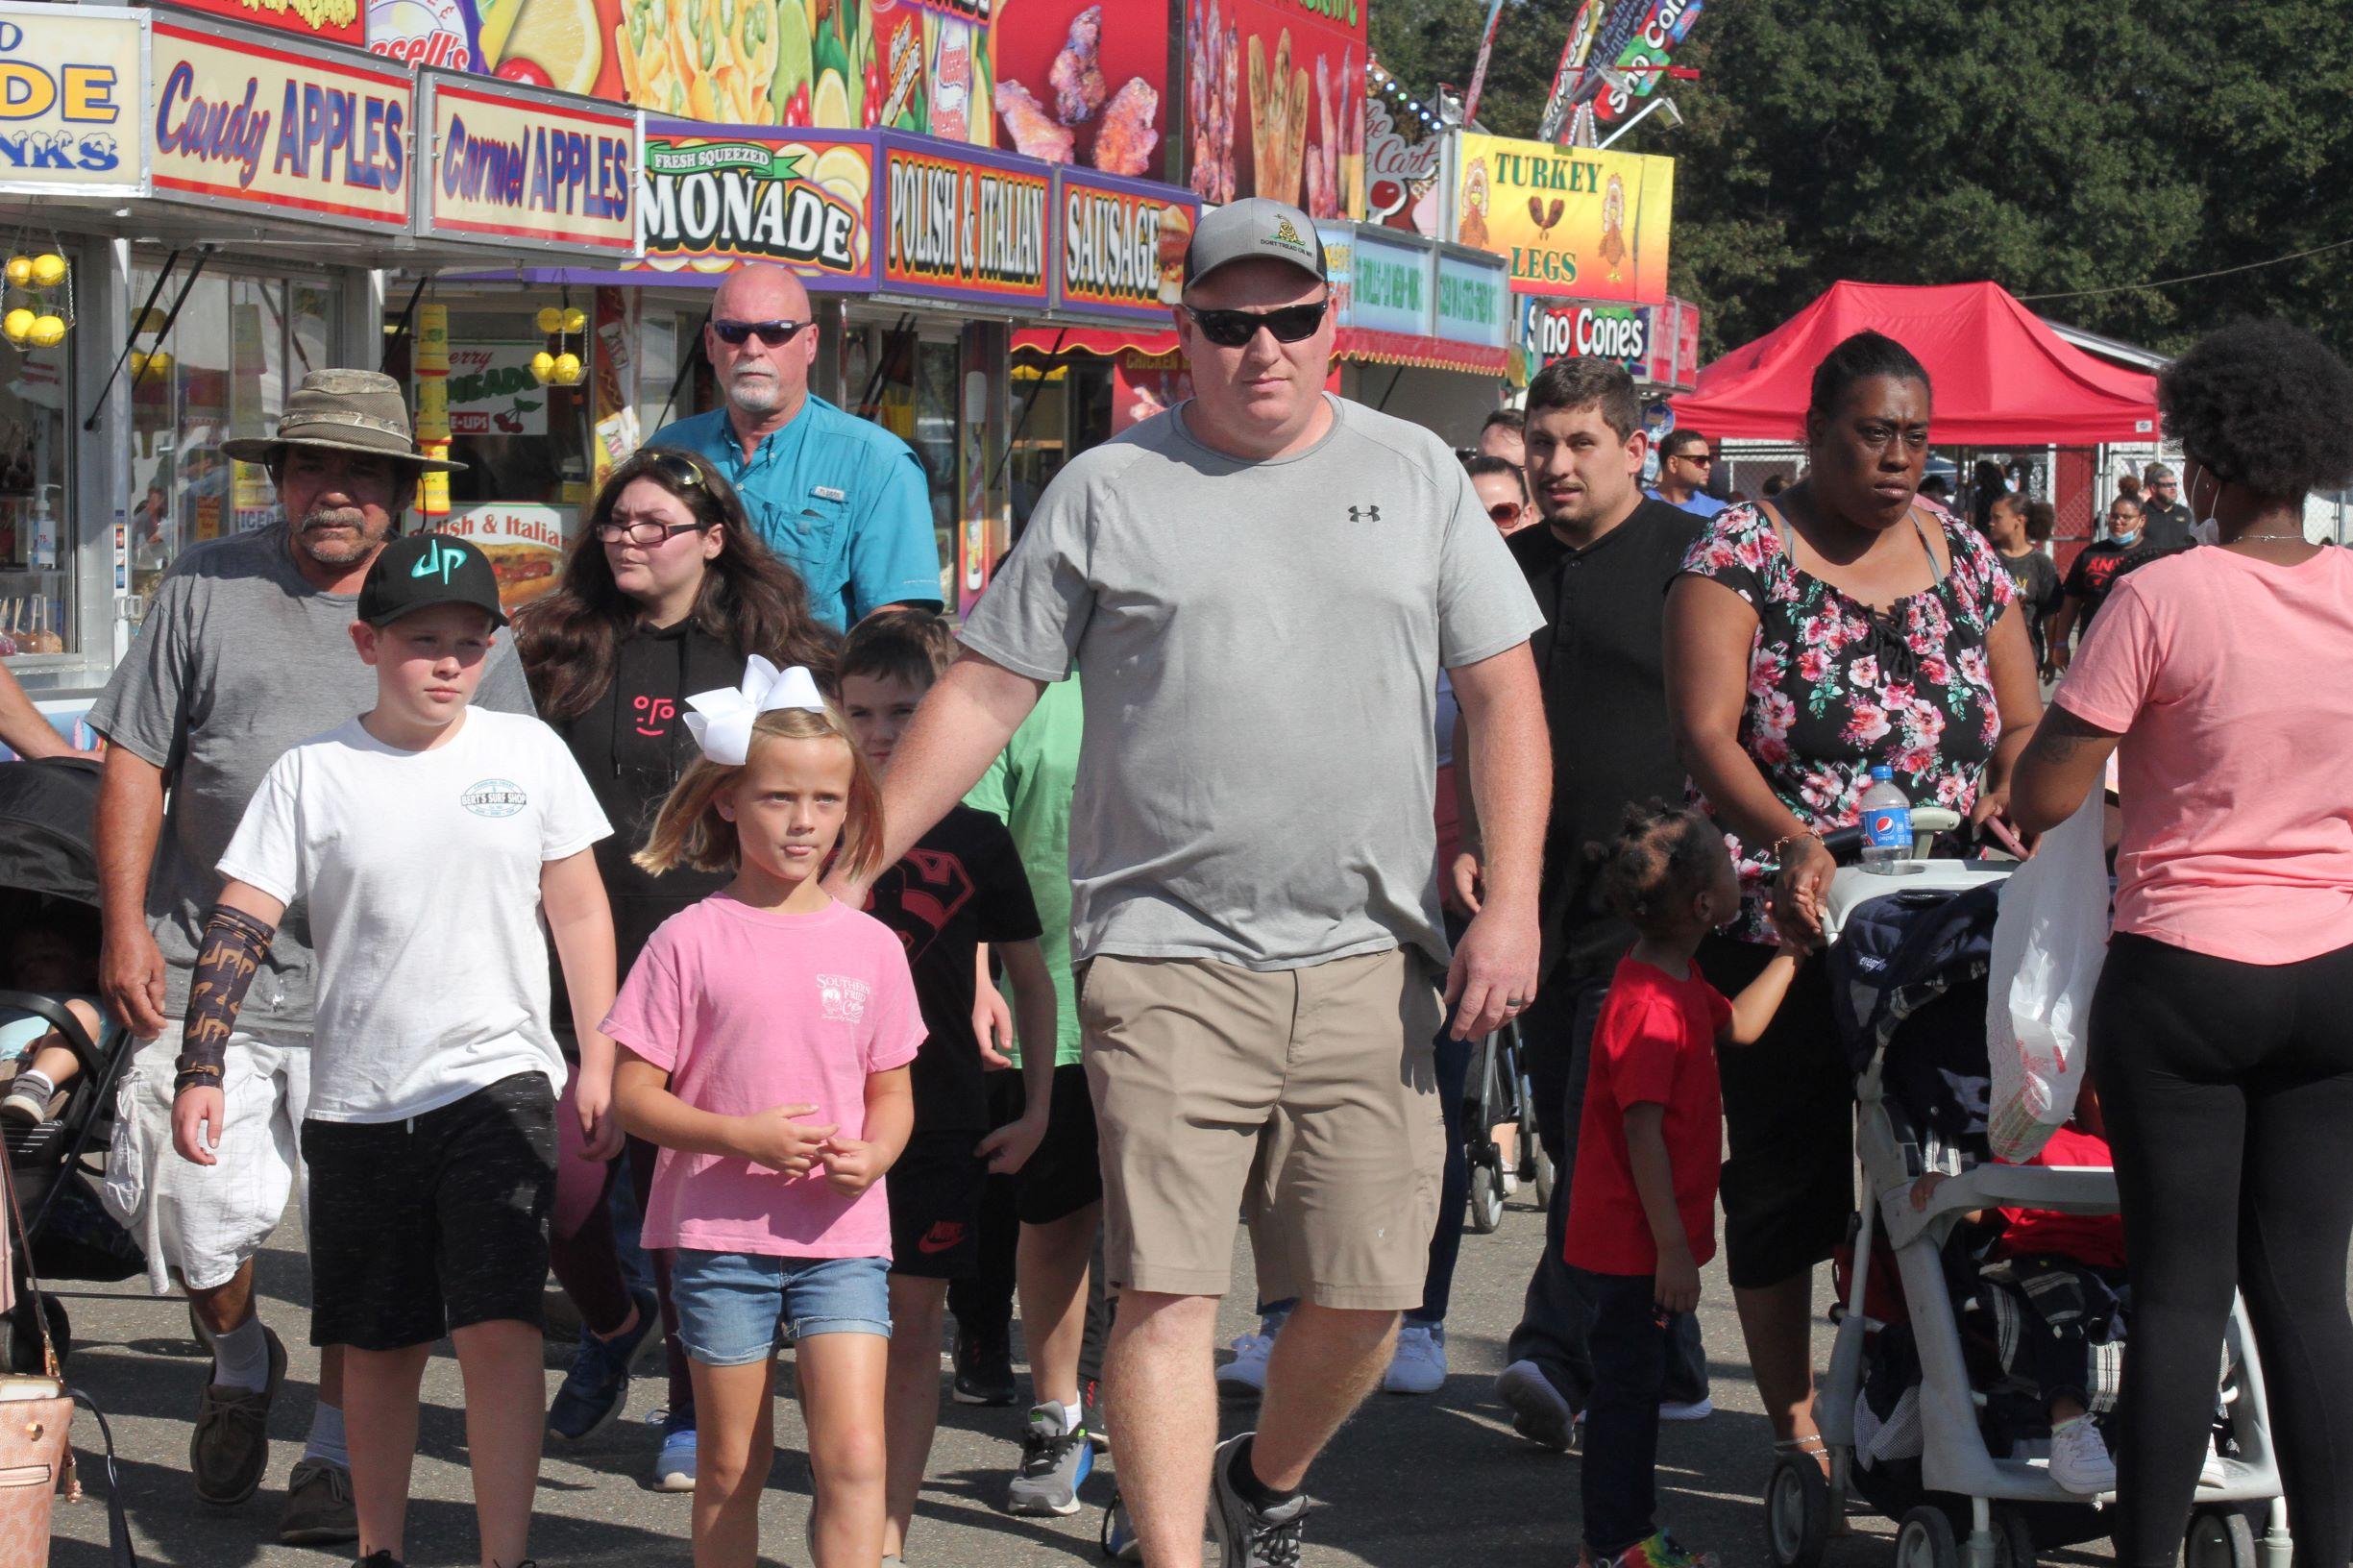 Wayne Regional Agricultural Fair: Day 5 Schedule